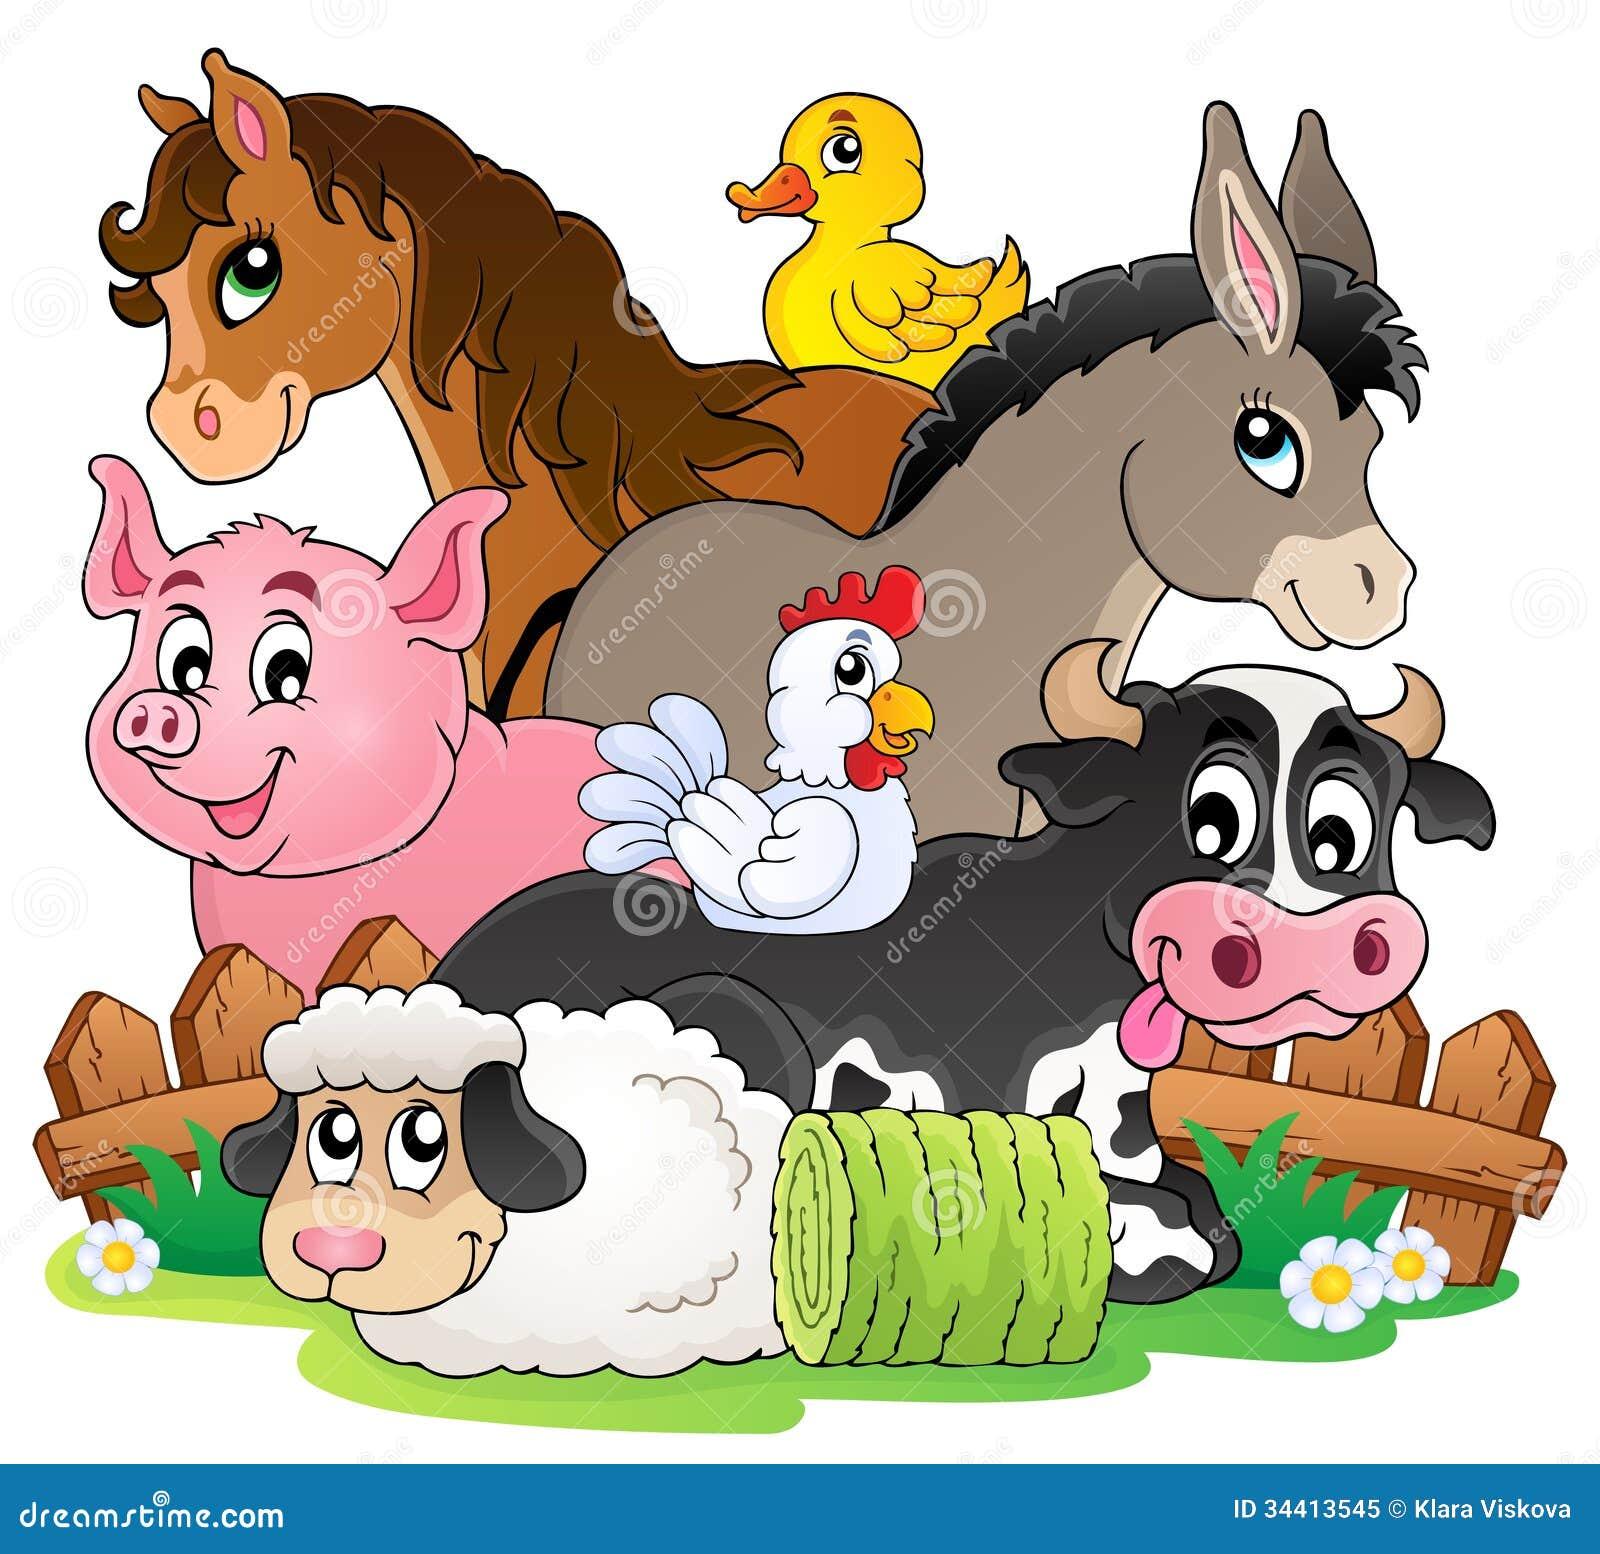 Farm animals topic image 2